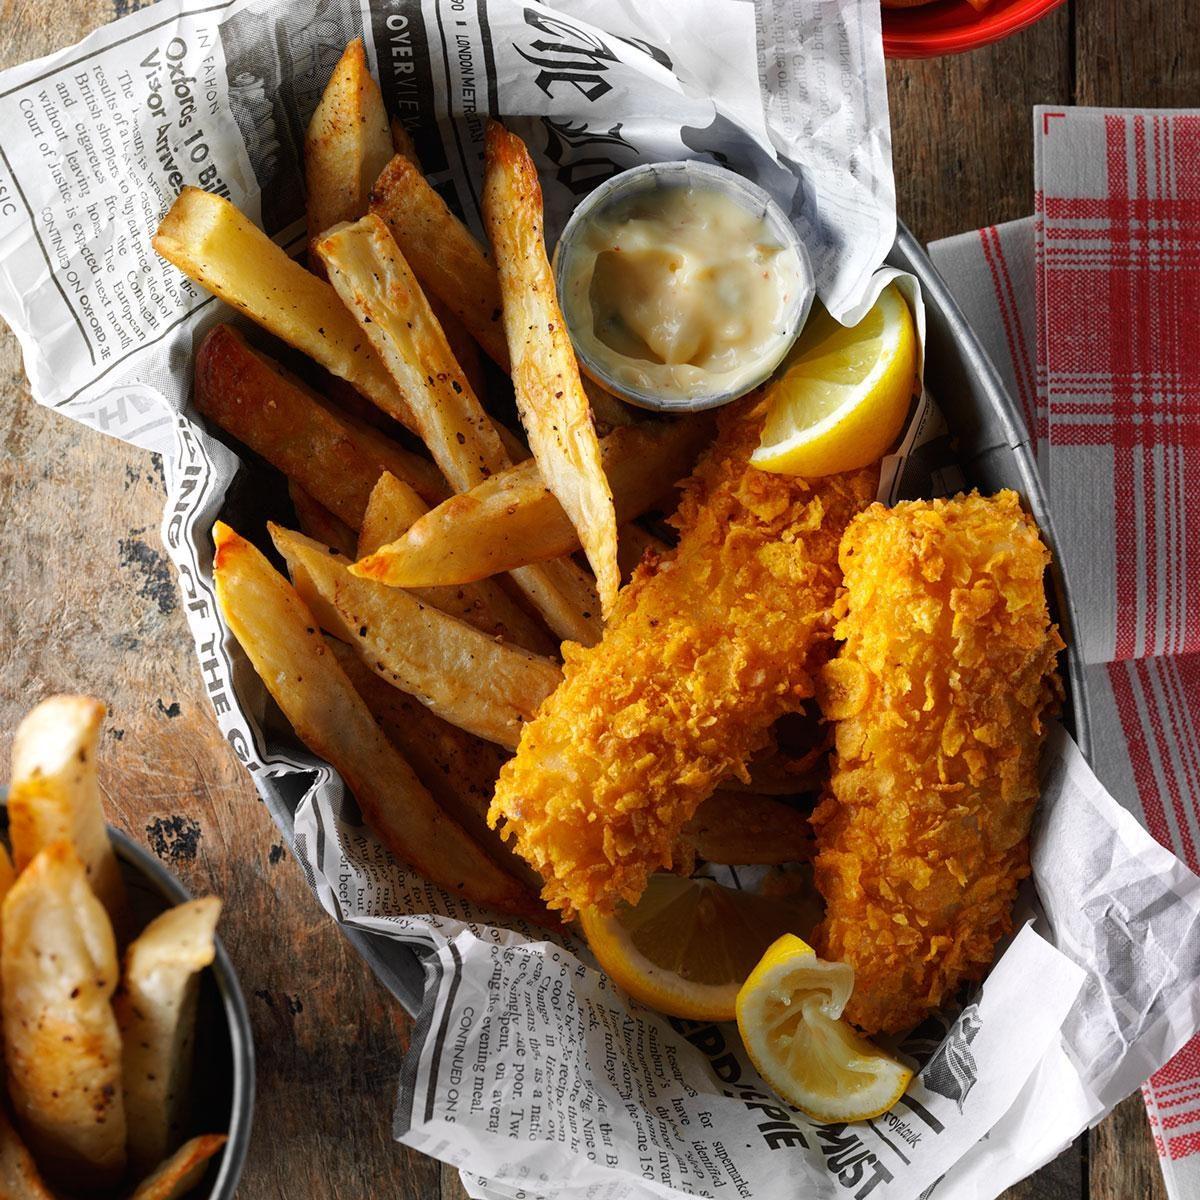 Saturday: Fish and Fries